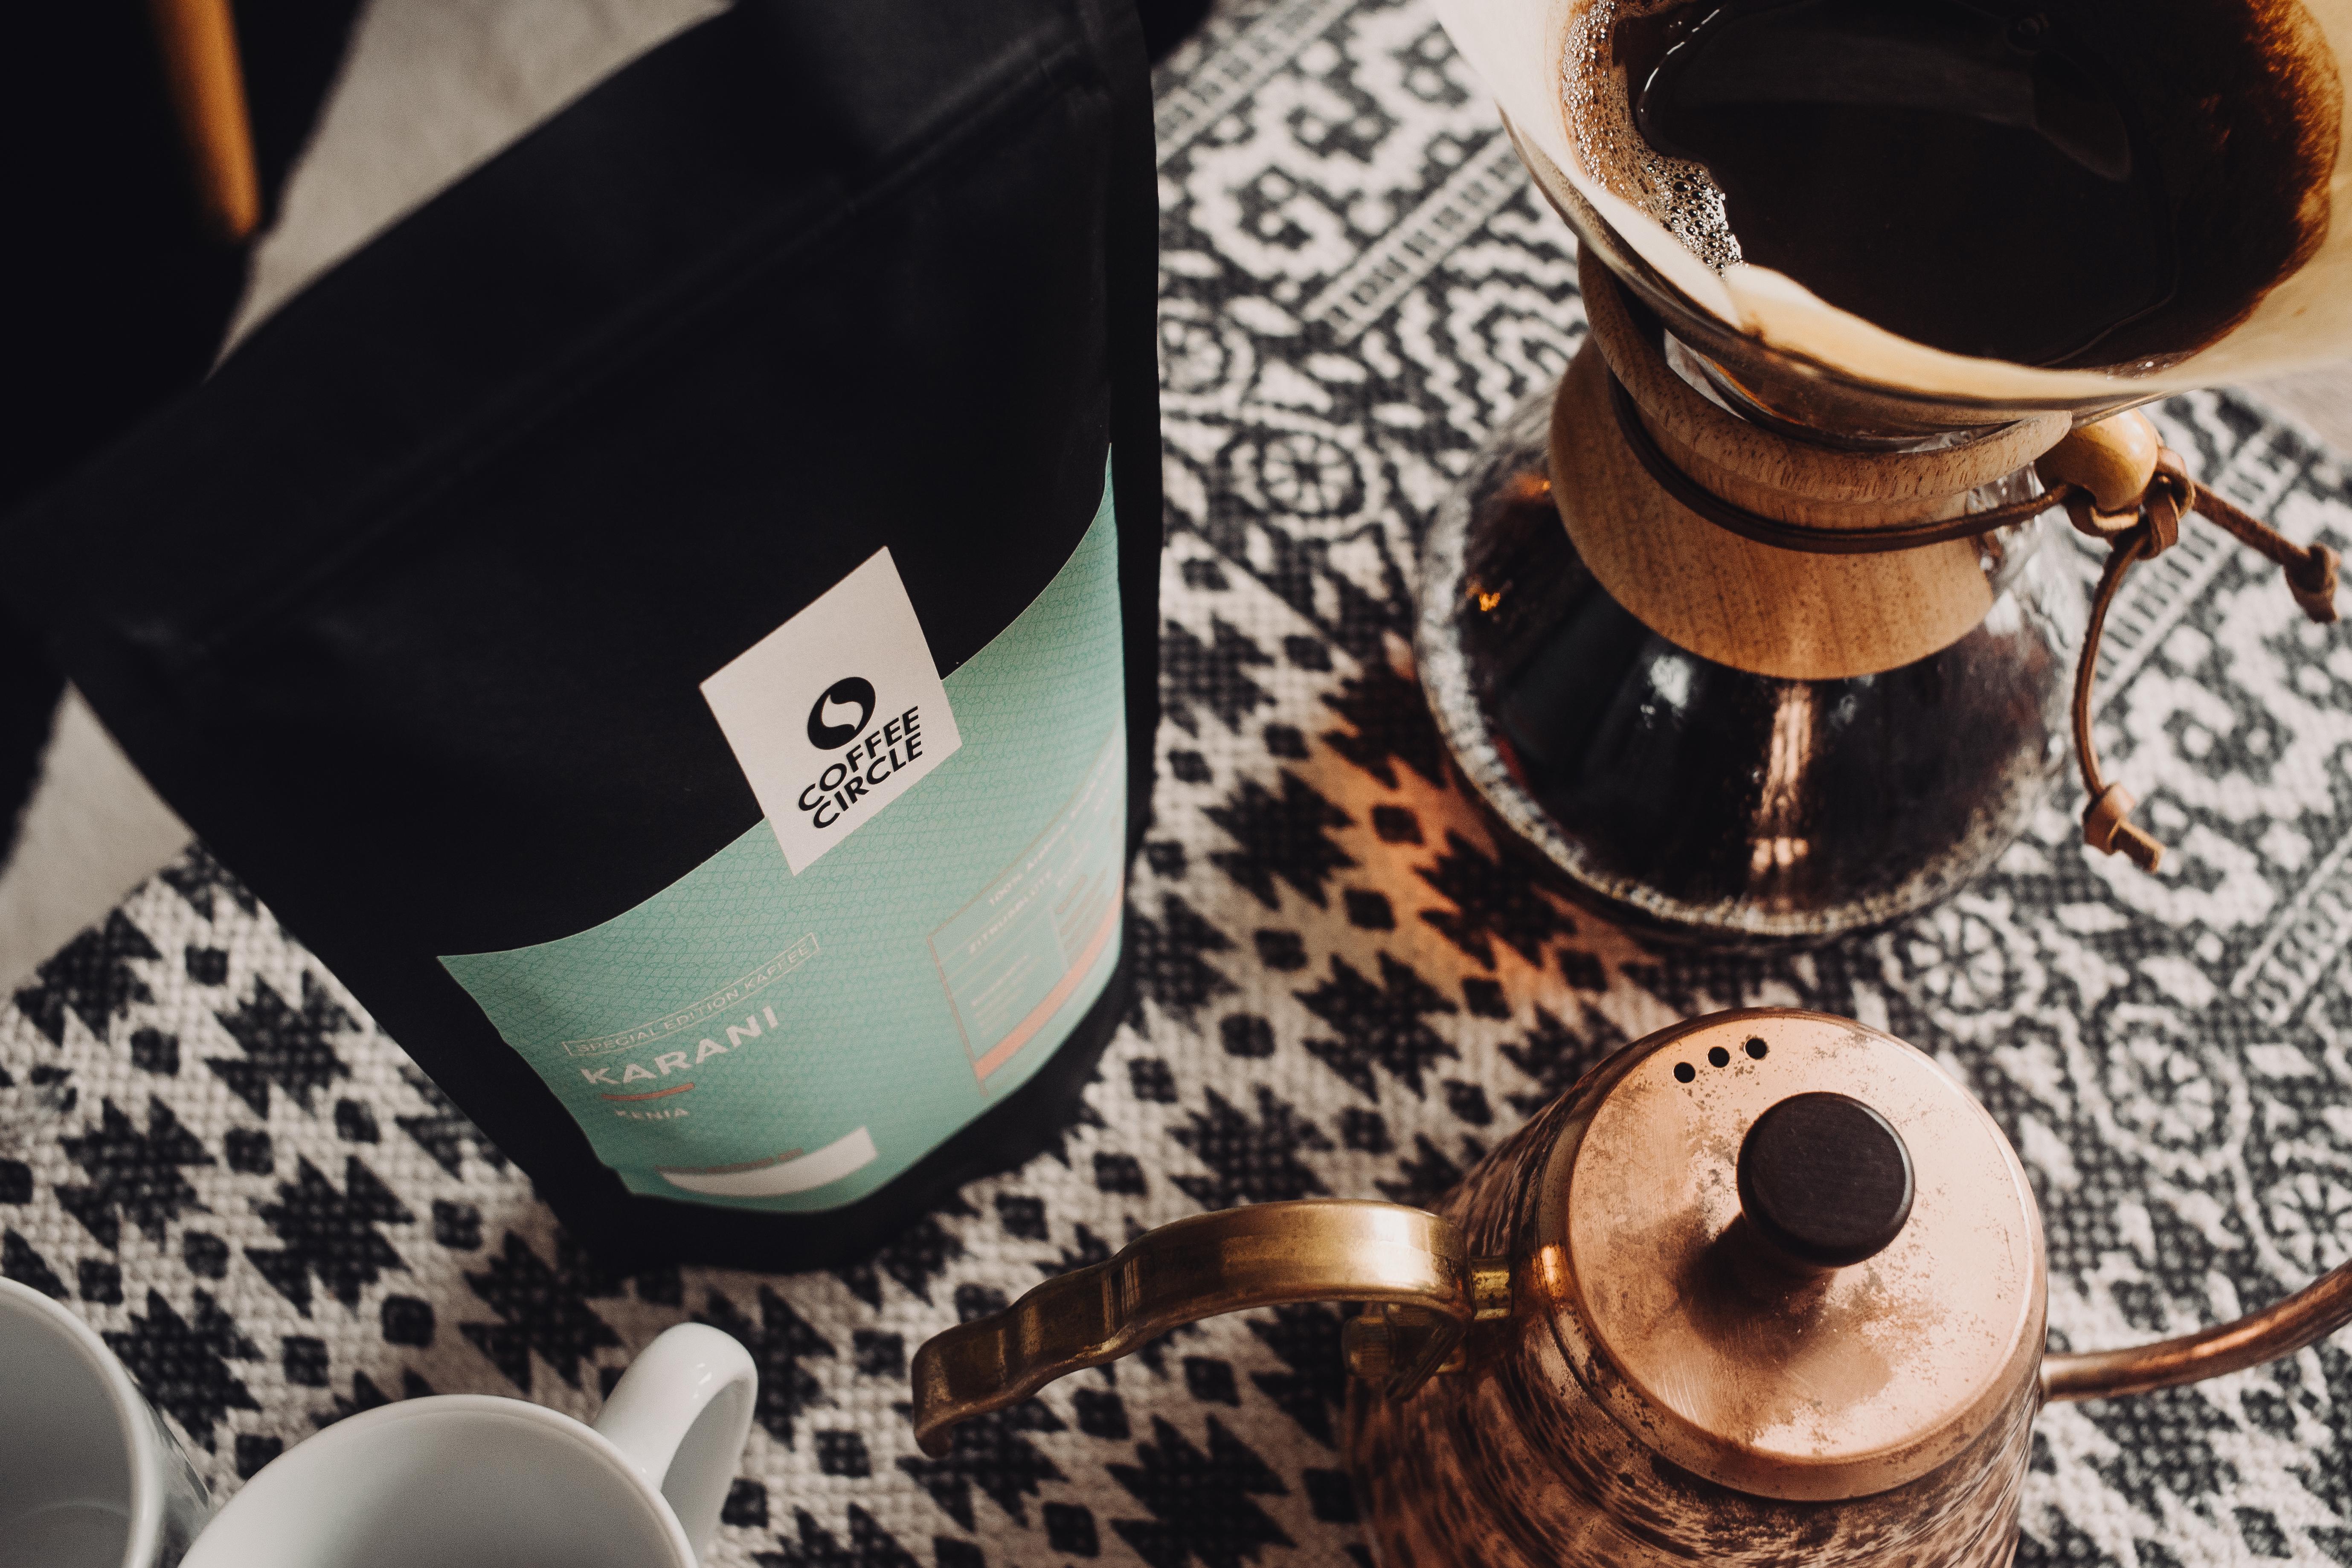 Unser Spezialitätenkaffee aus Kenia